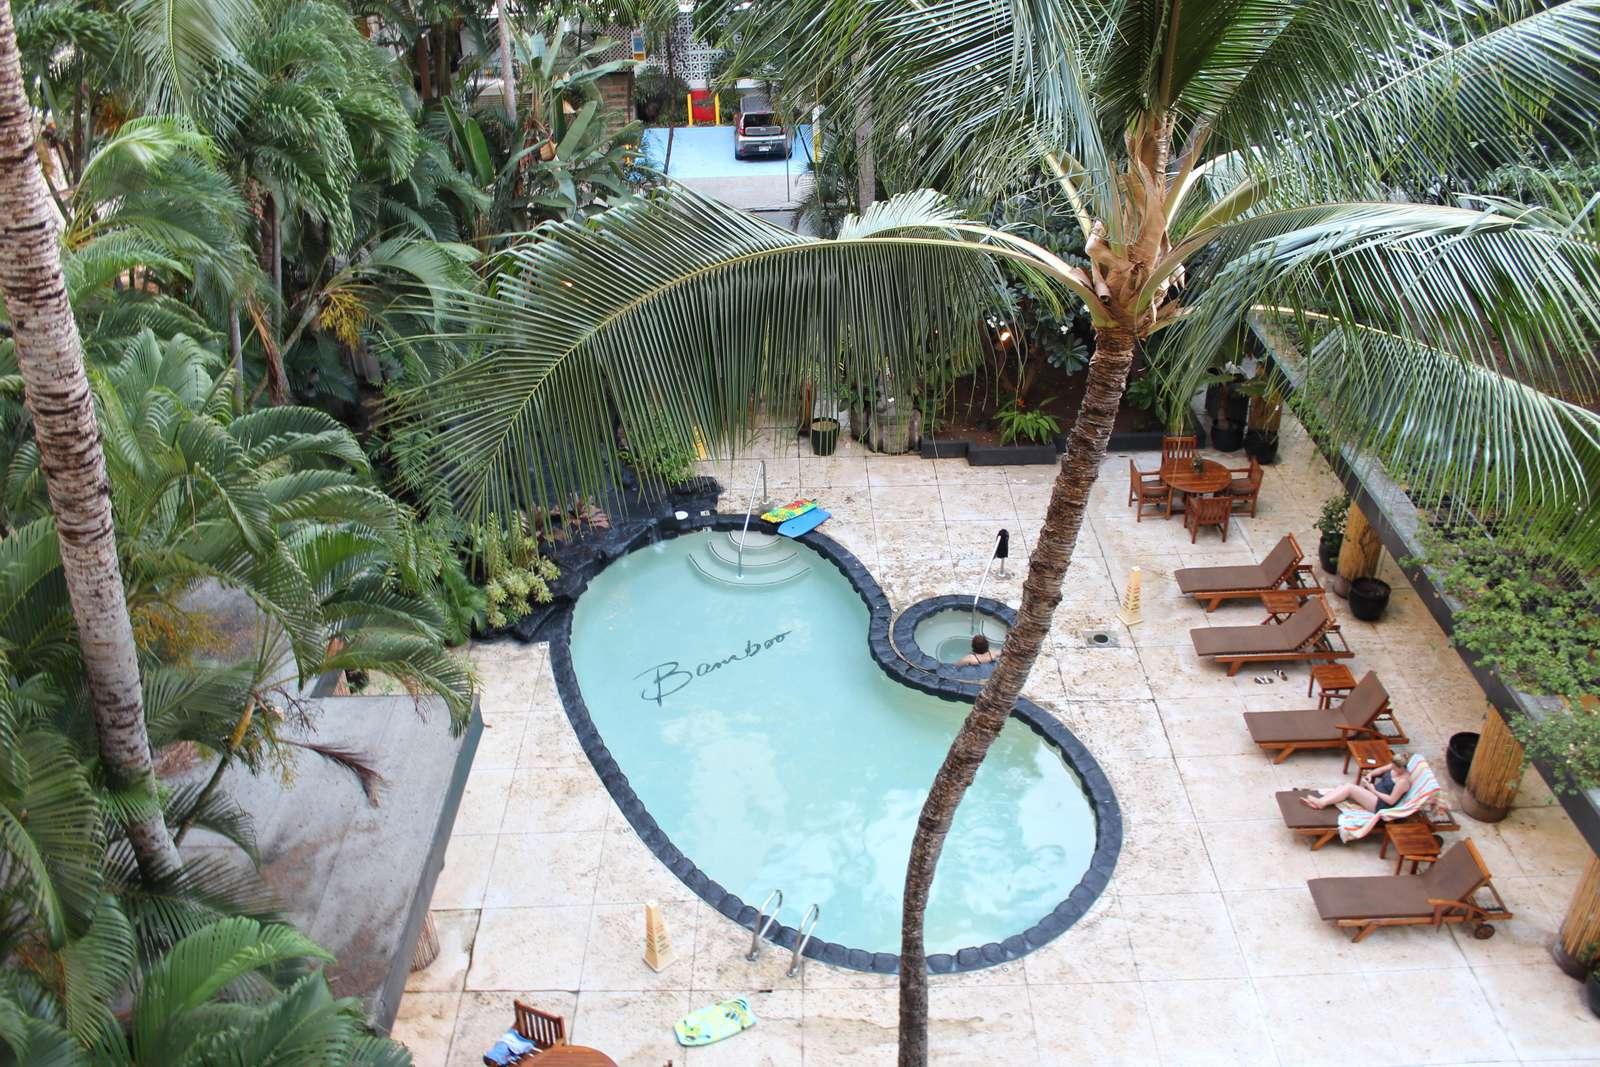 Lush communal pool and sun deck area